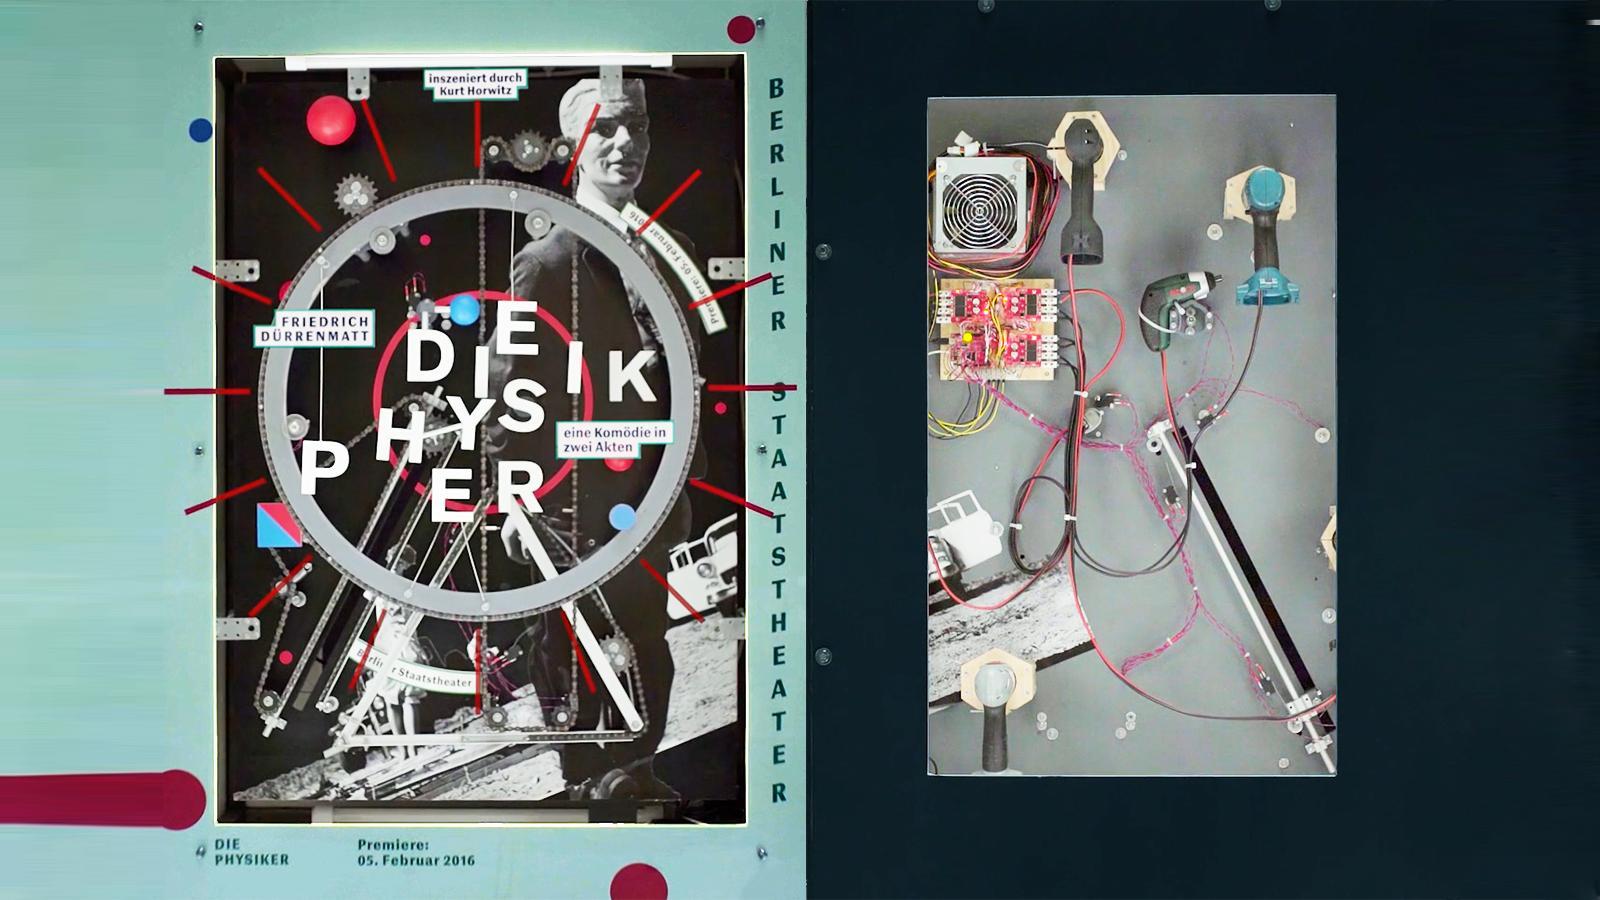 Theaterplakate alive - Faust und Physiker als analoges Bewegtbild ...